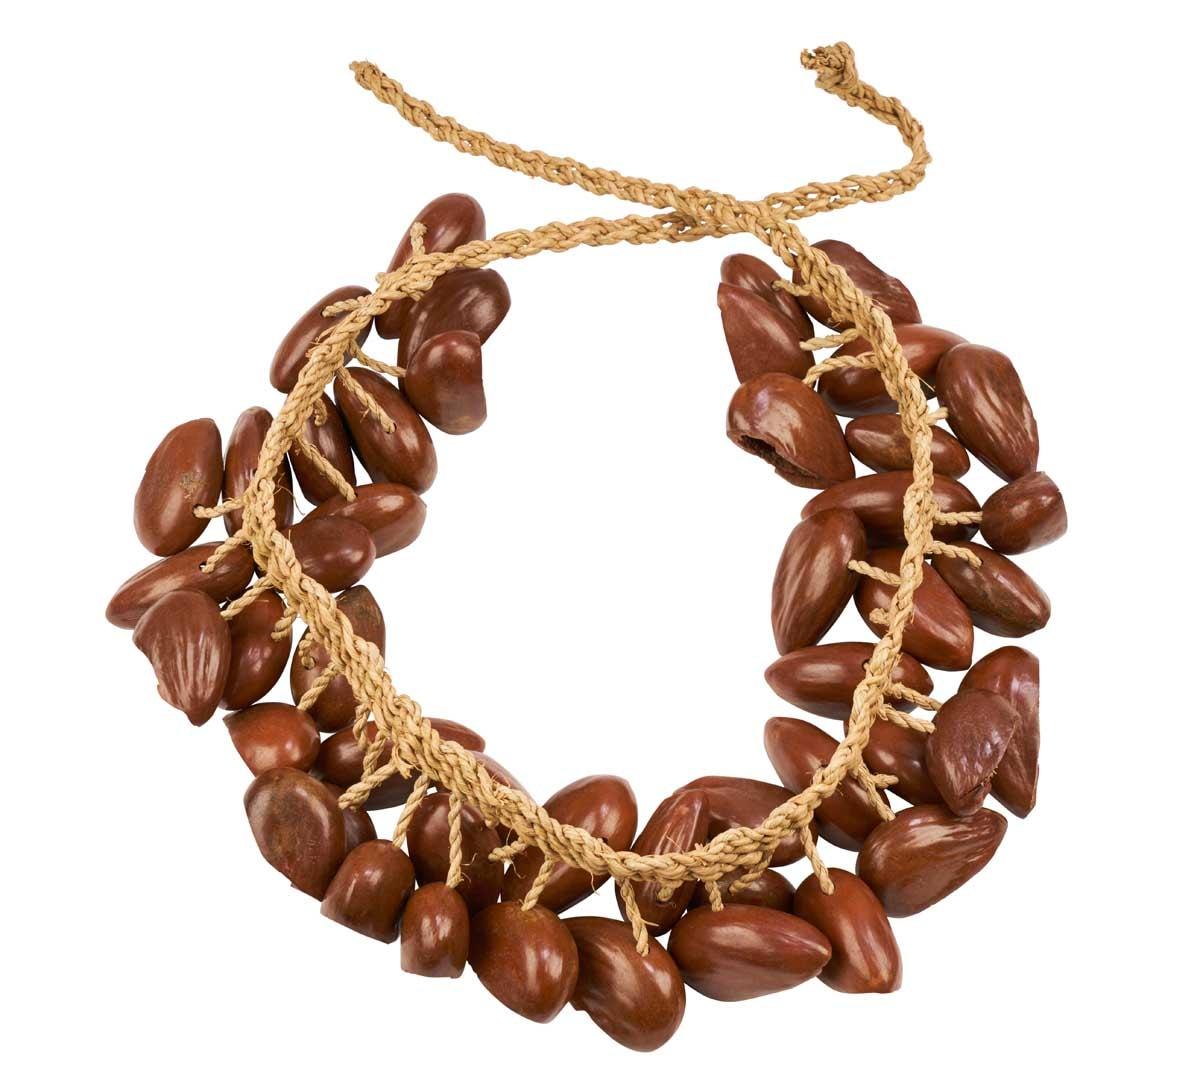 Colanut rattle, string, L 80cm, nuts 50cm